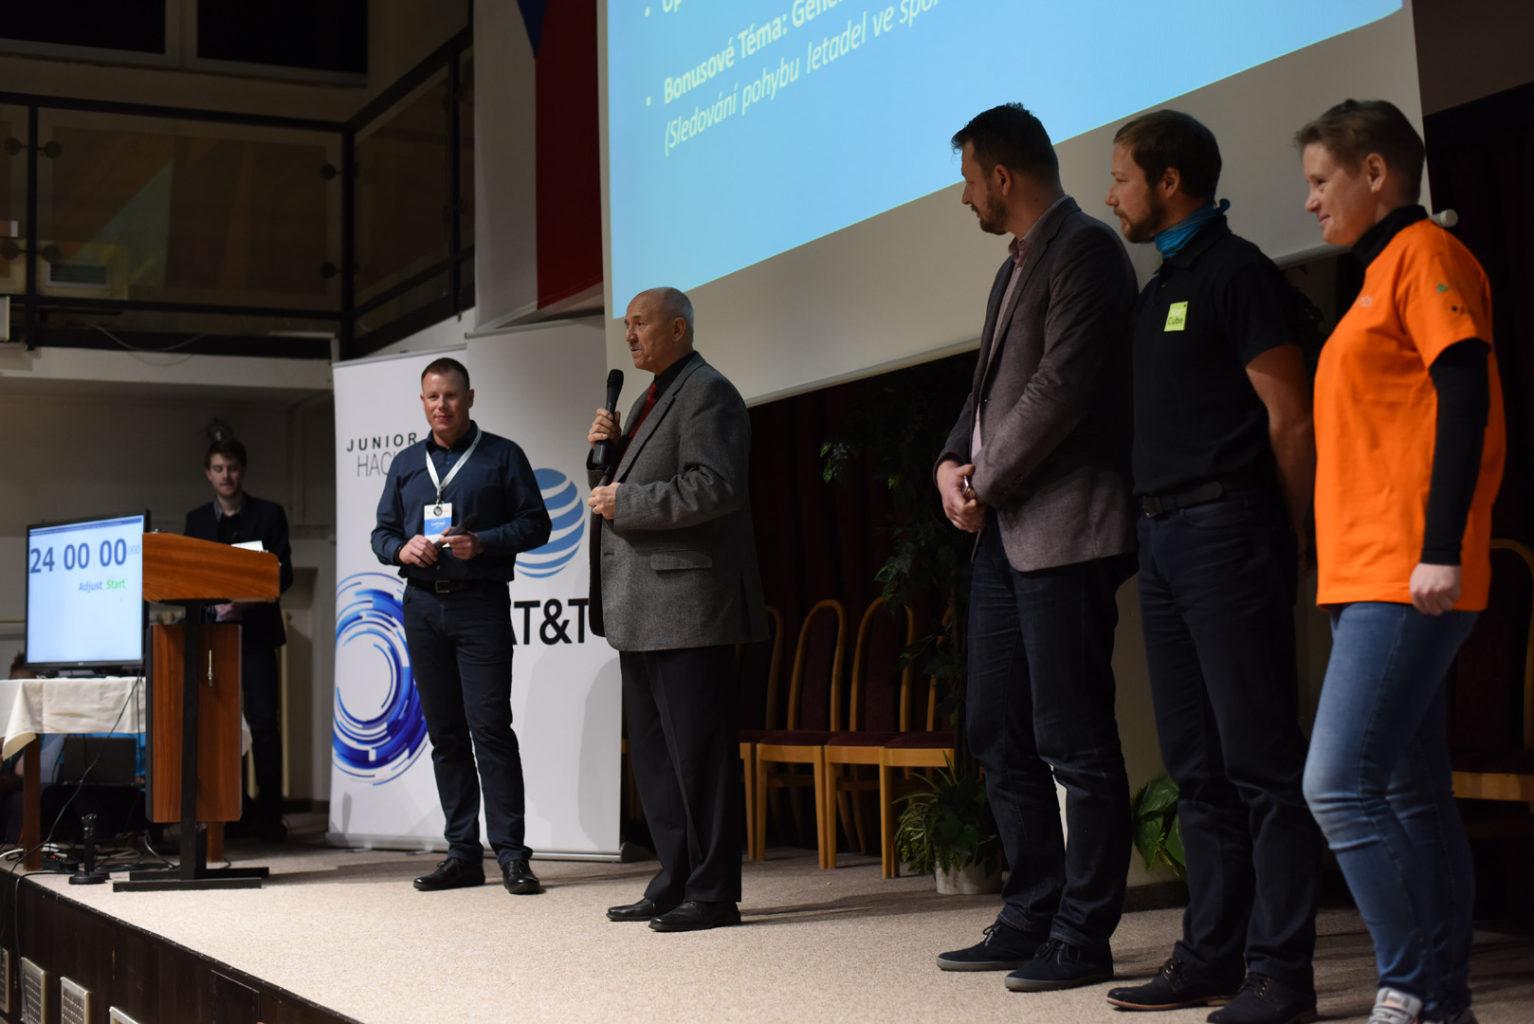 Junior Hackathon 2017 Brno. Vladimír Šimíček Director of Secondary School of Informatics, Post and Finance Brno.